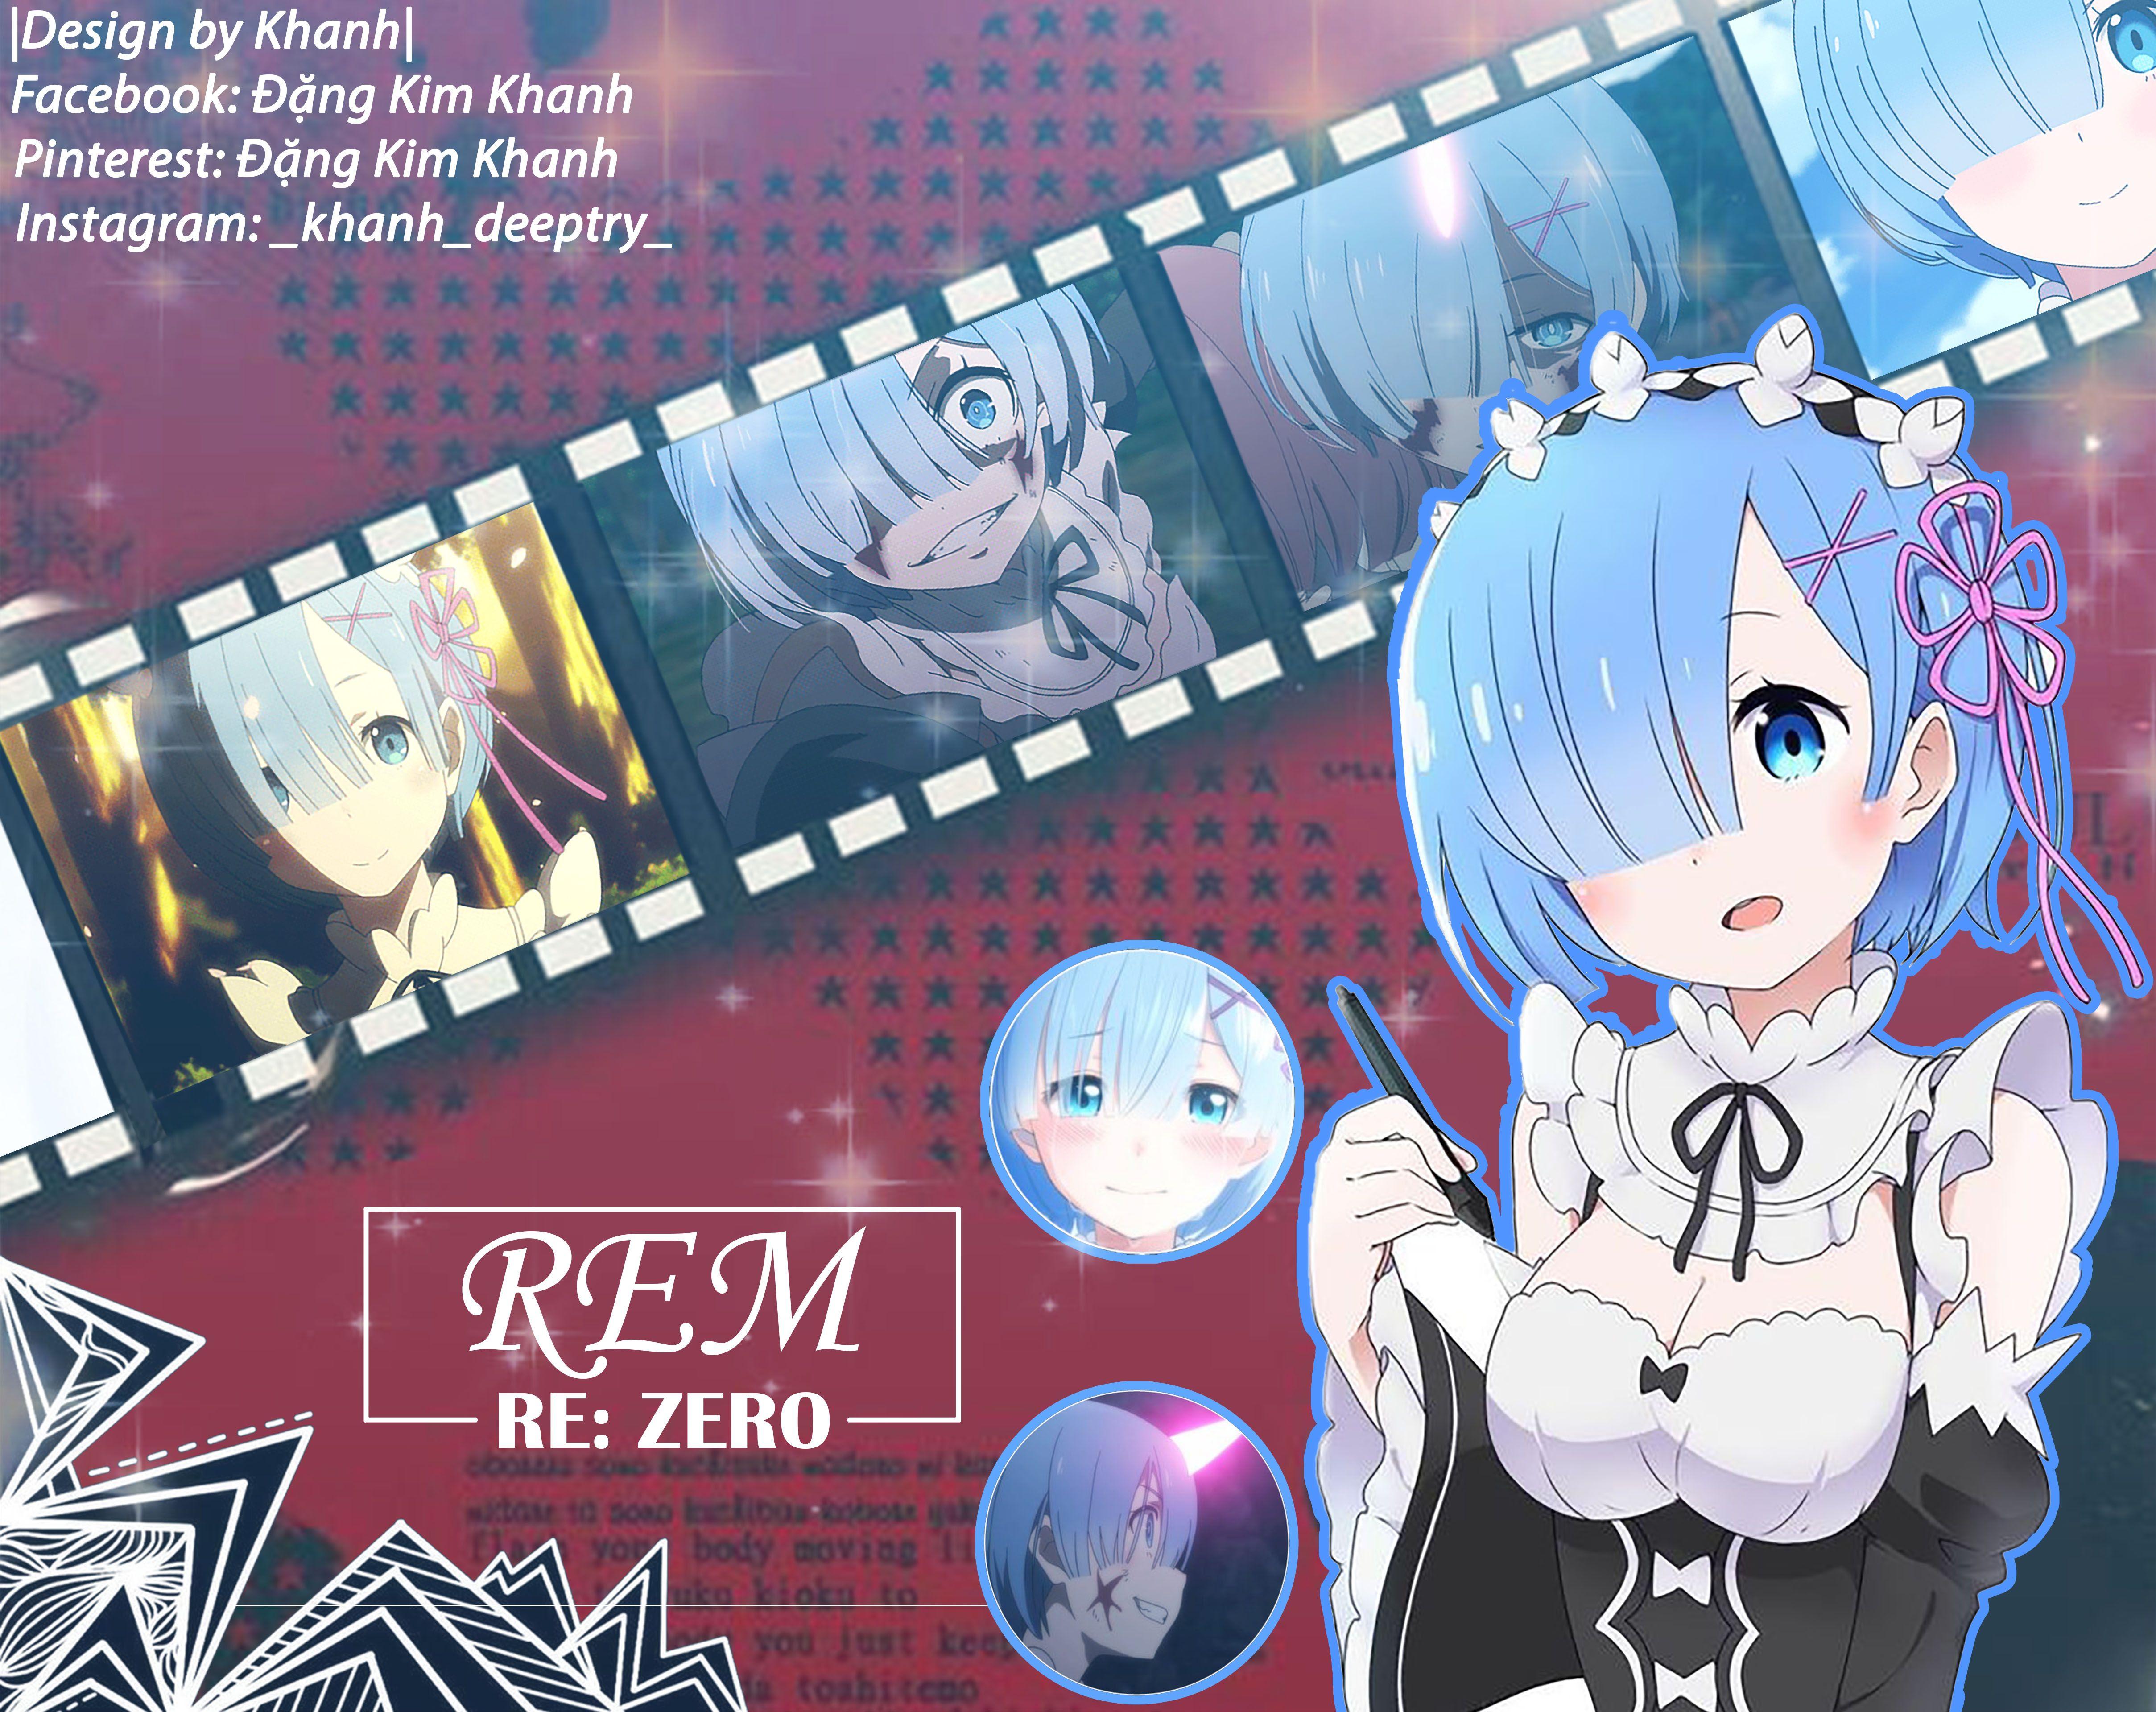 Imgur Anime Aesthetic Anime Editing Inspiration